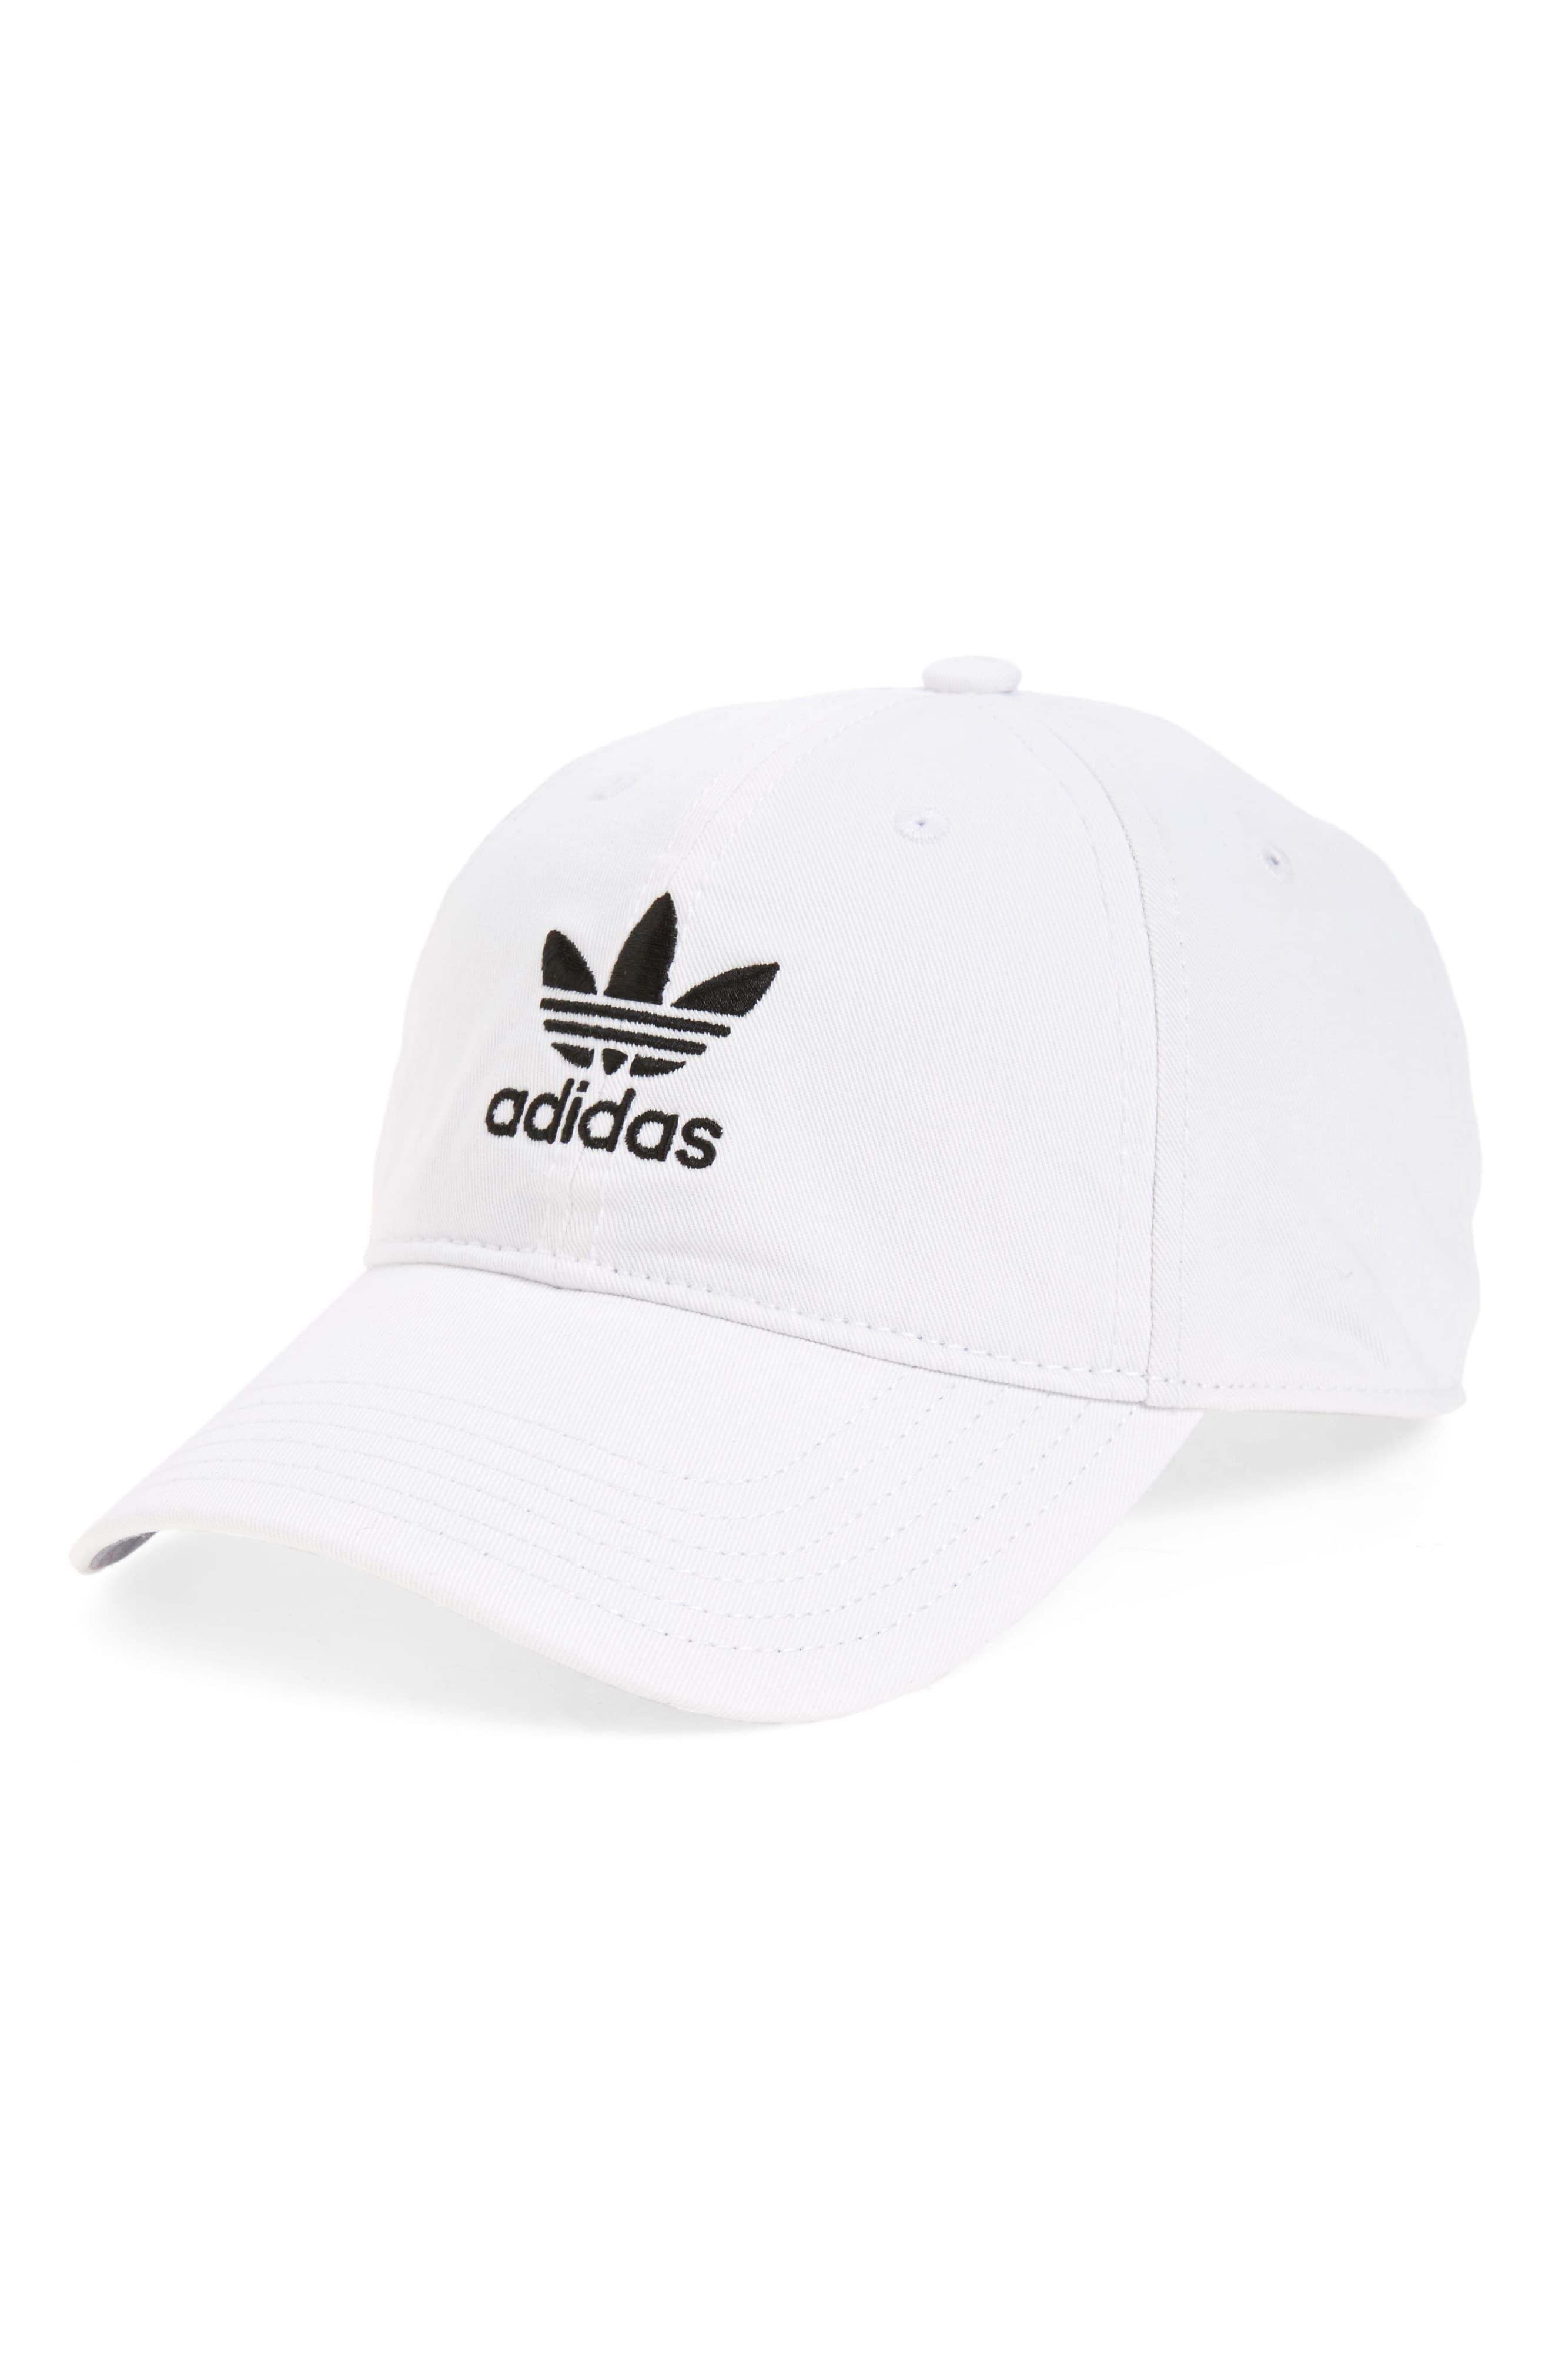 Adidas Originals Relaxed Baseball Cap Nordstrom In 2021 Hats For Men Adidas Cap Baseball Cap